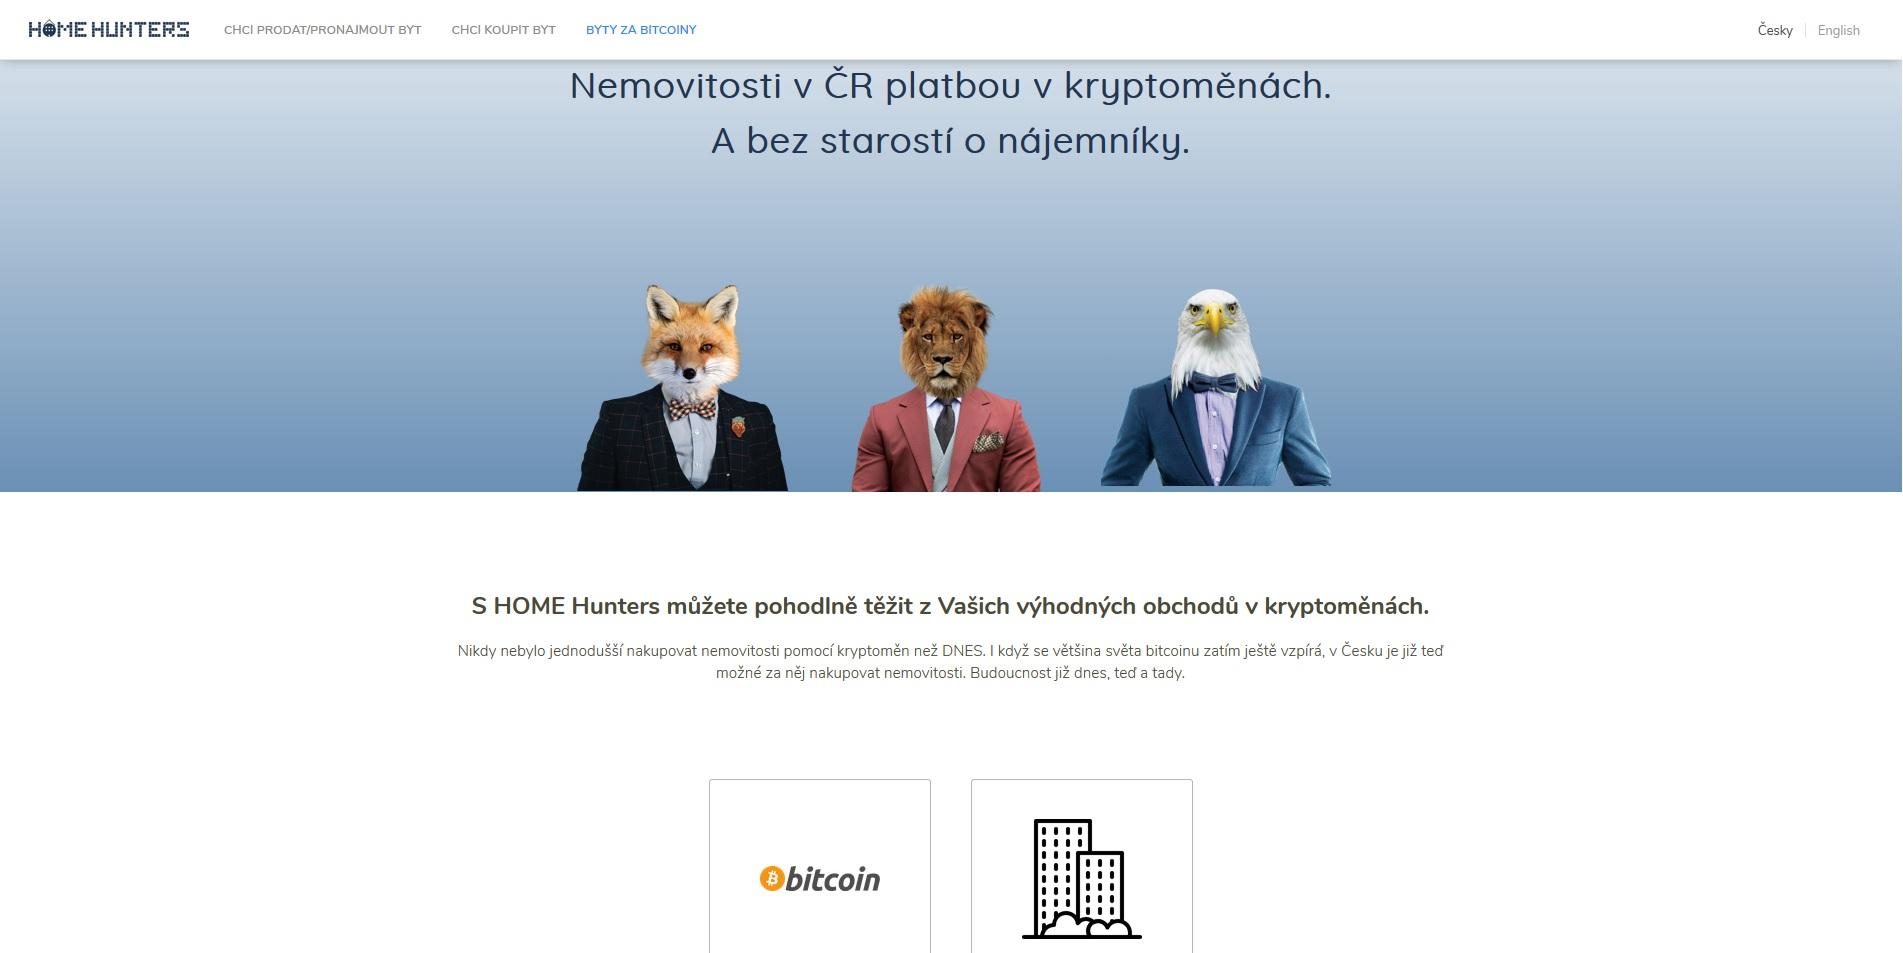 https://fontech.startitup.sk/taziari-nestihaju-spracovat-vsetky-transakcie-bitcoinu/